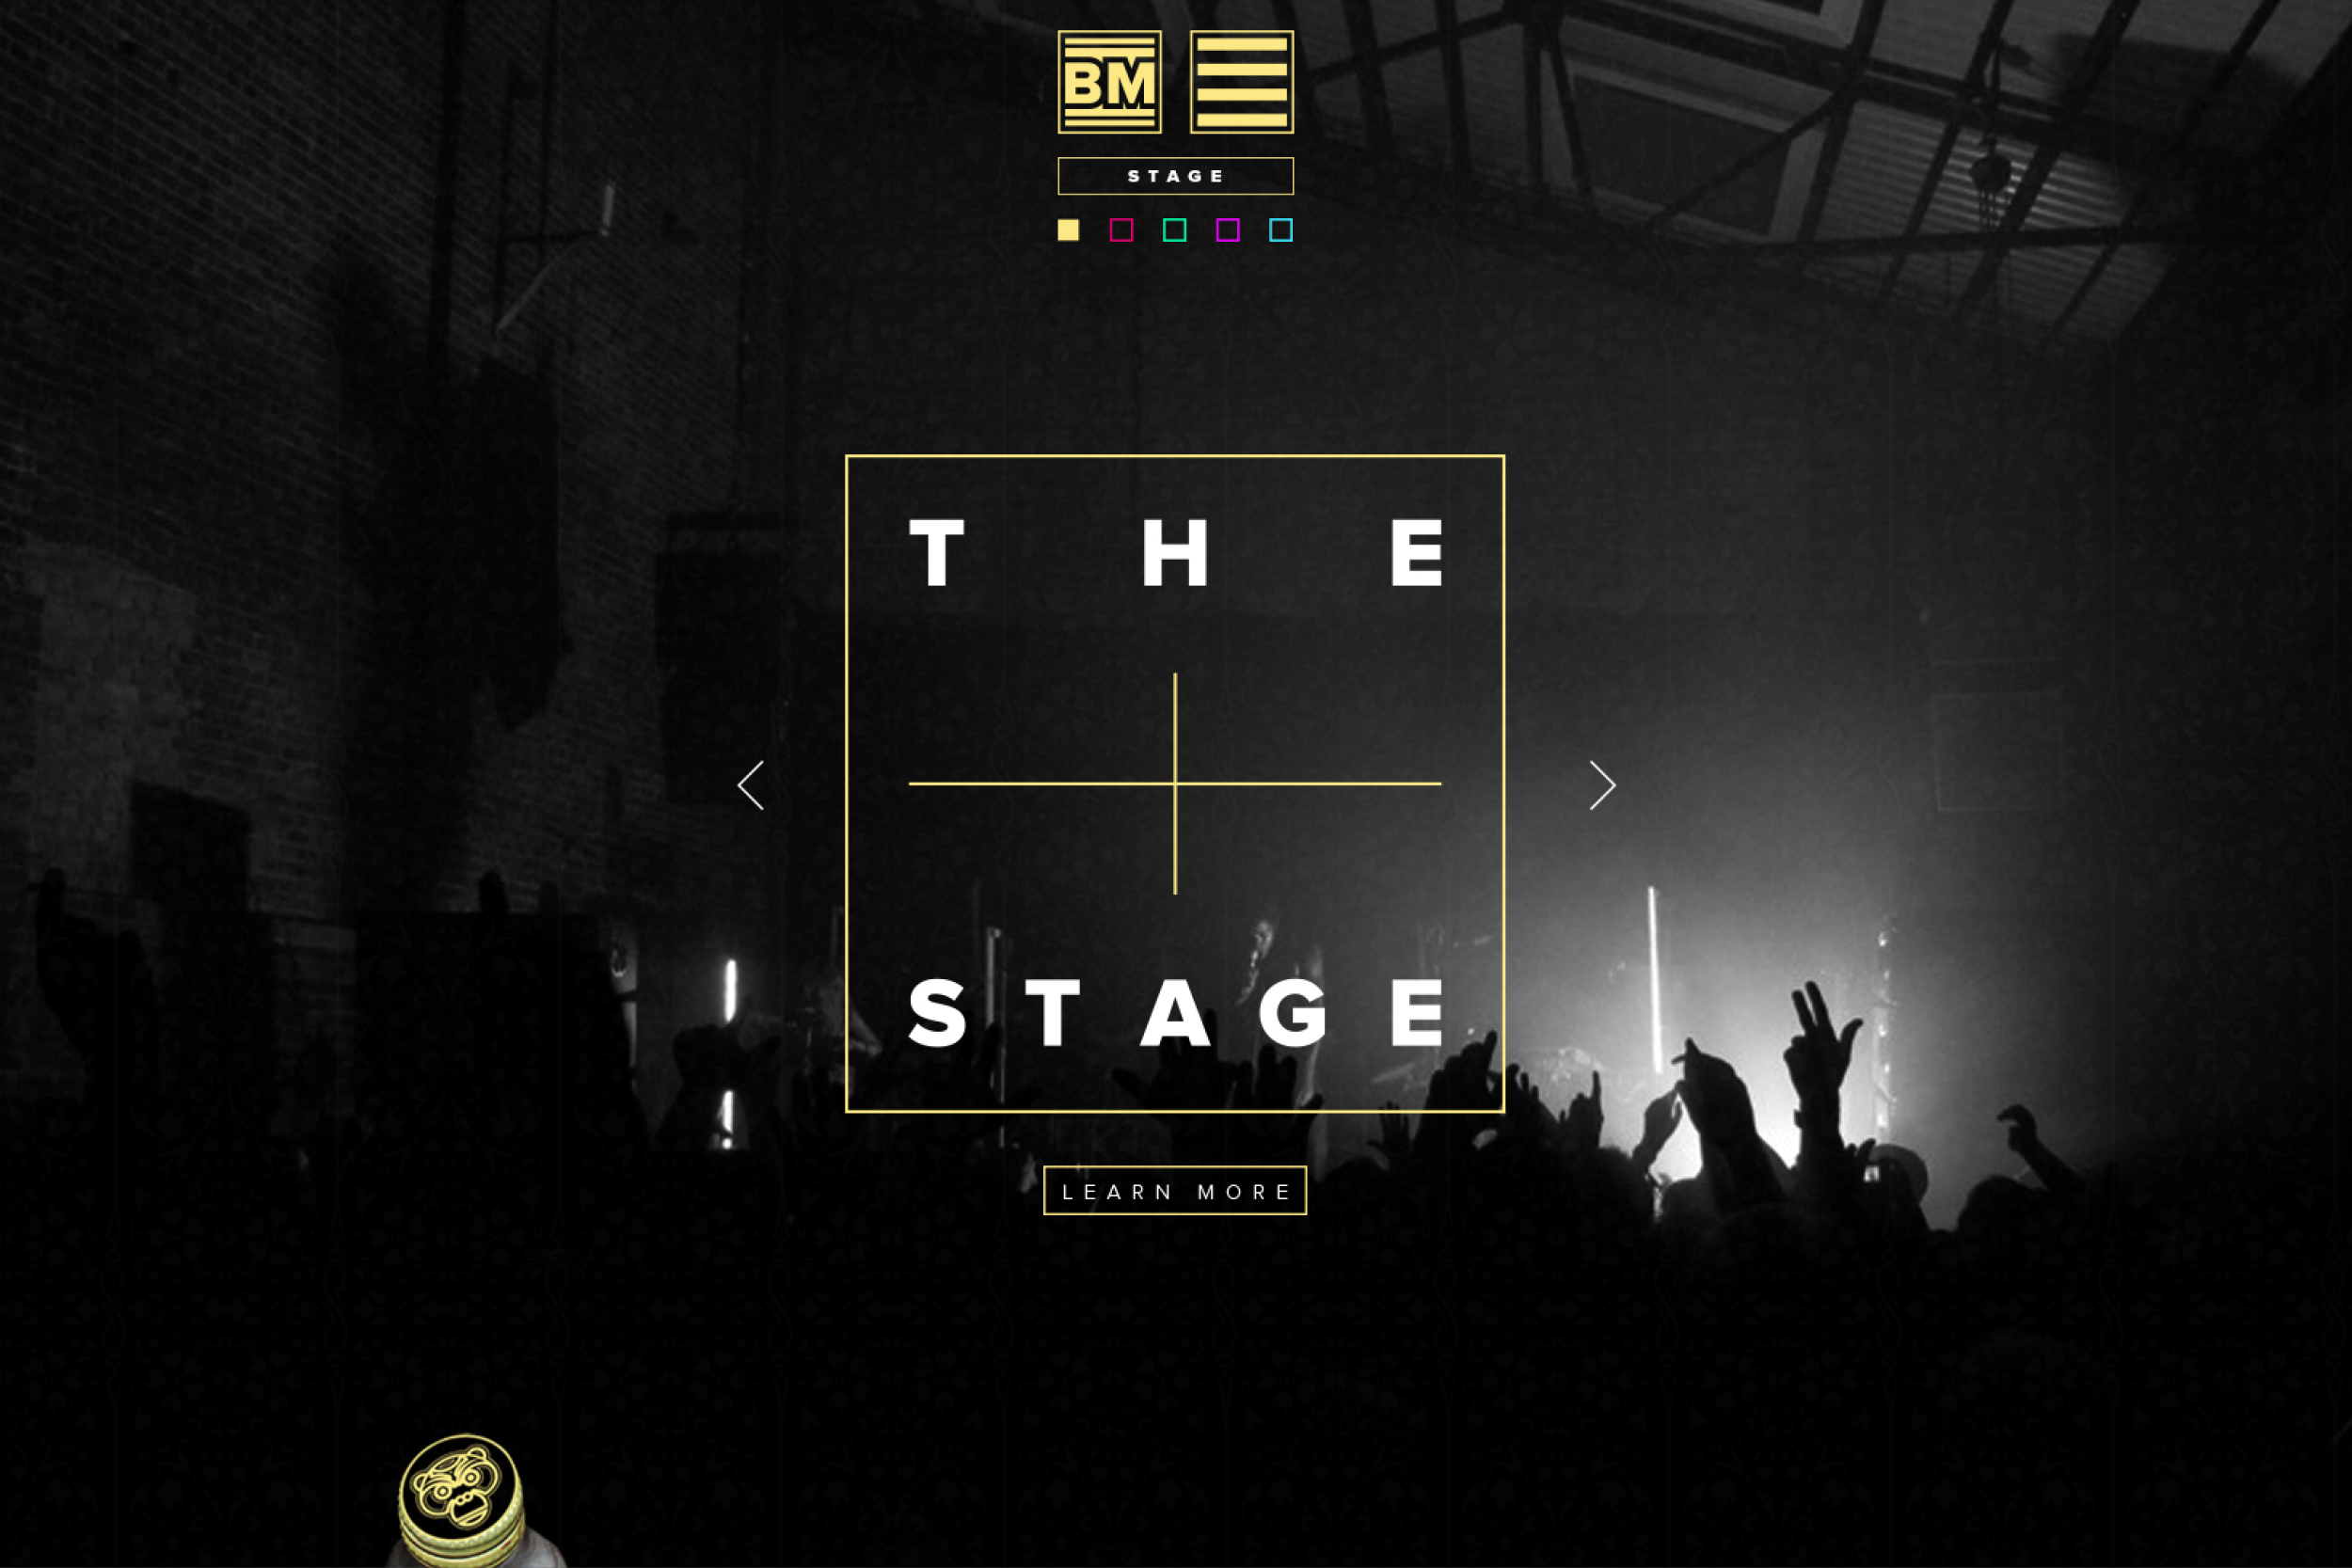 BM Stage